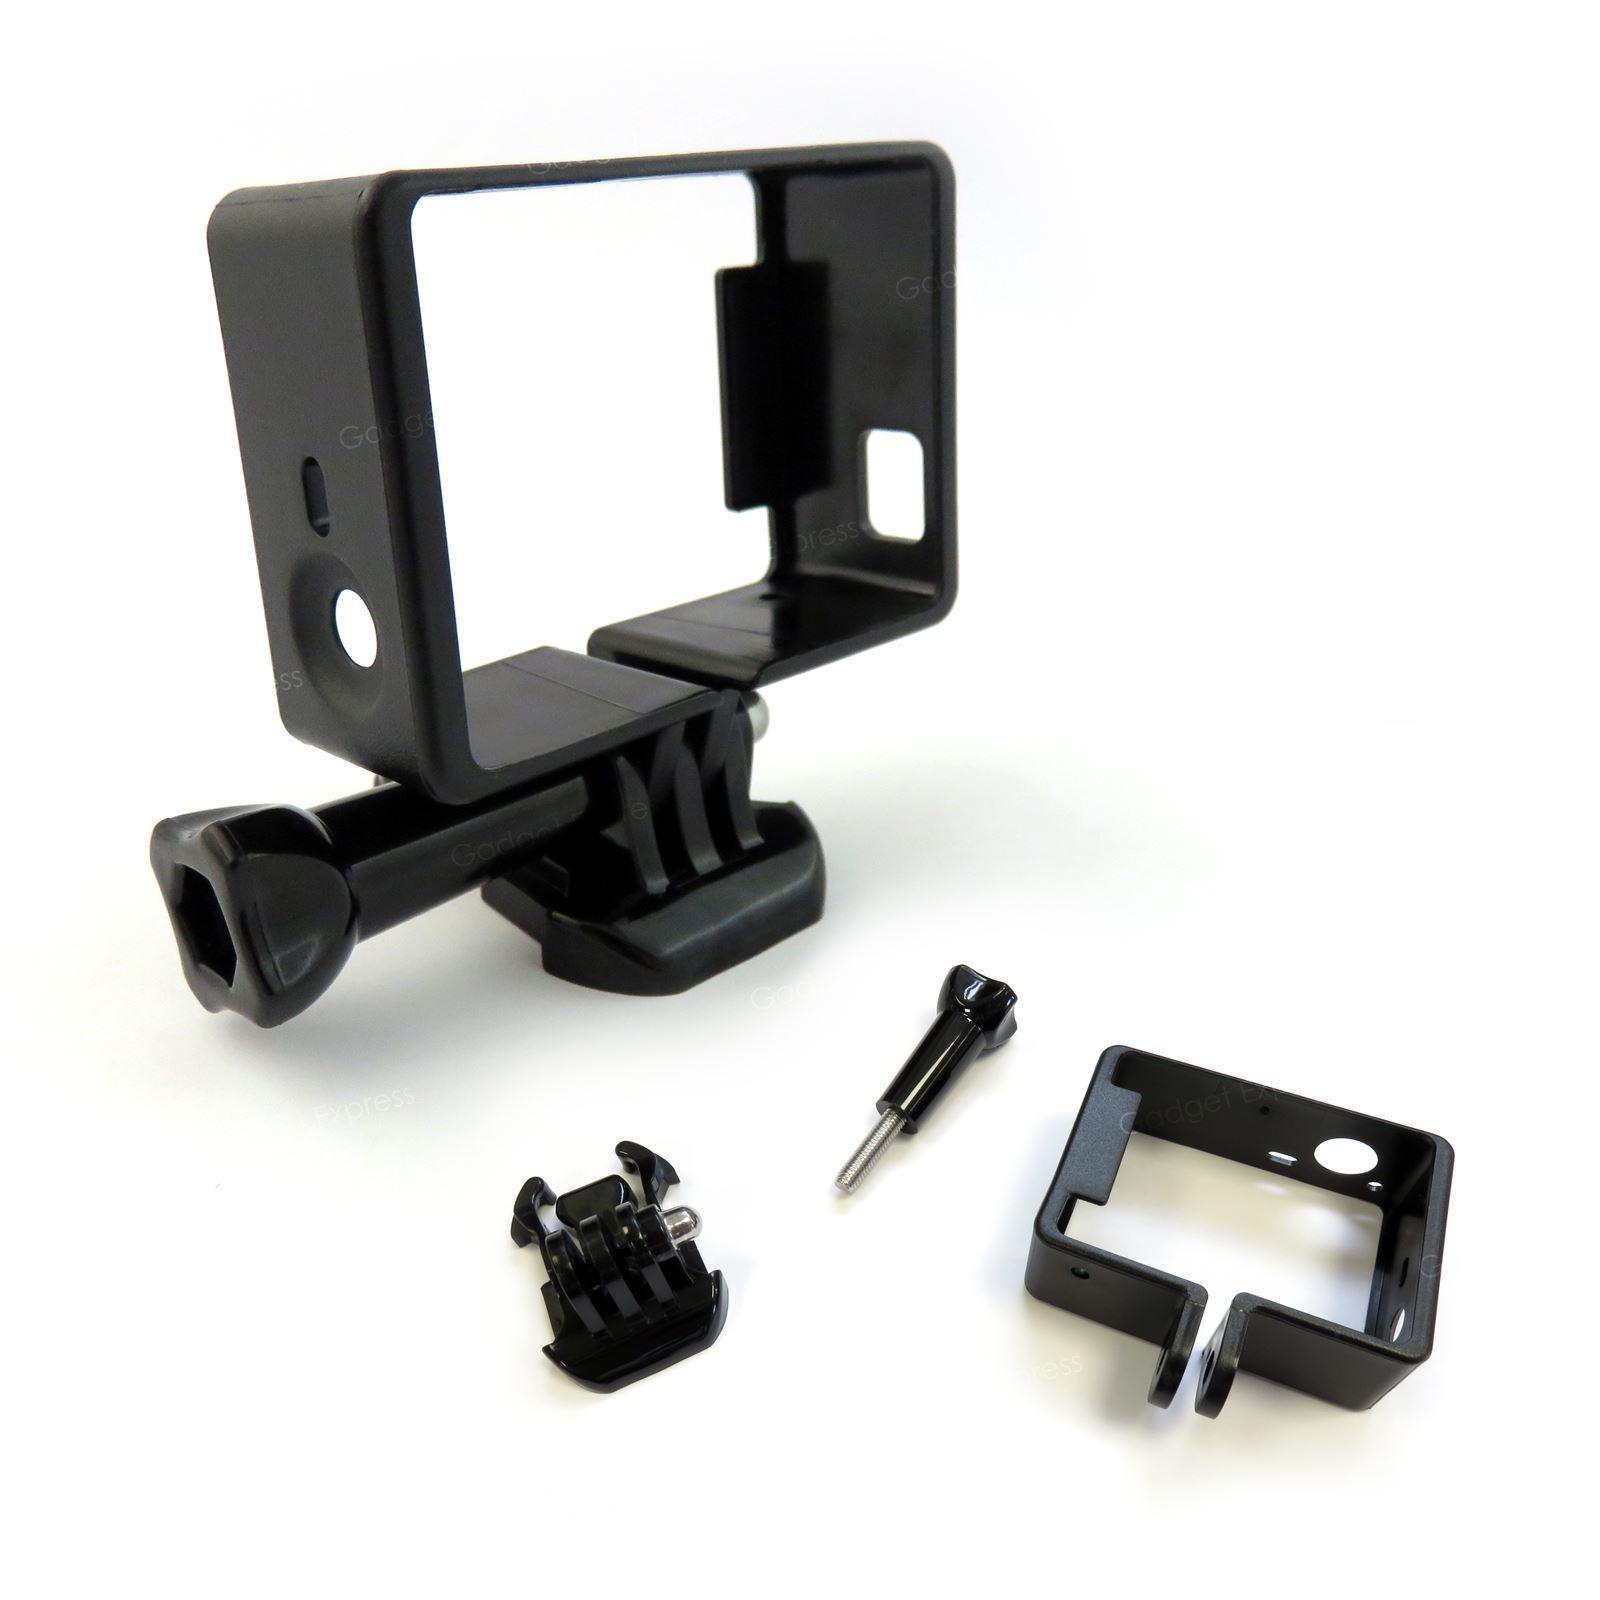 Regular Physique Mount for GoPro Hero three+ 4 High-def digital camera Border Case Housing Gear